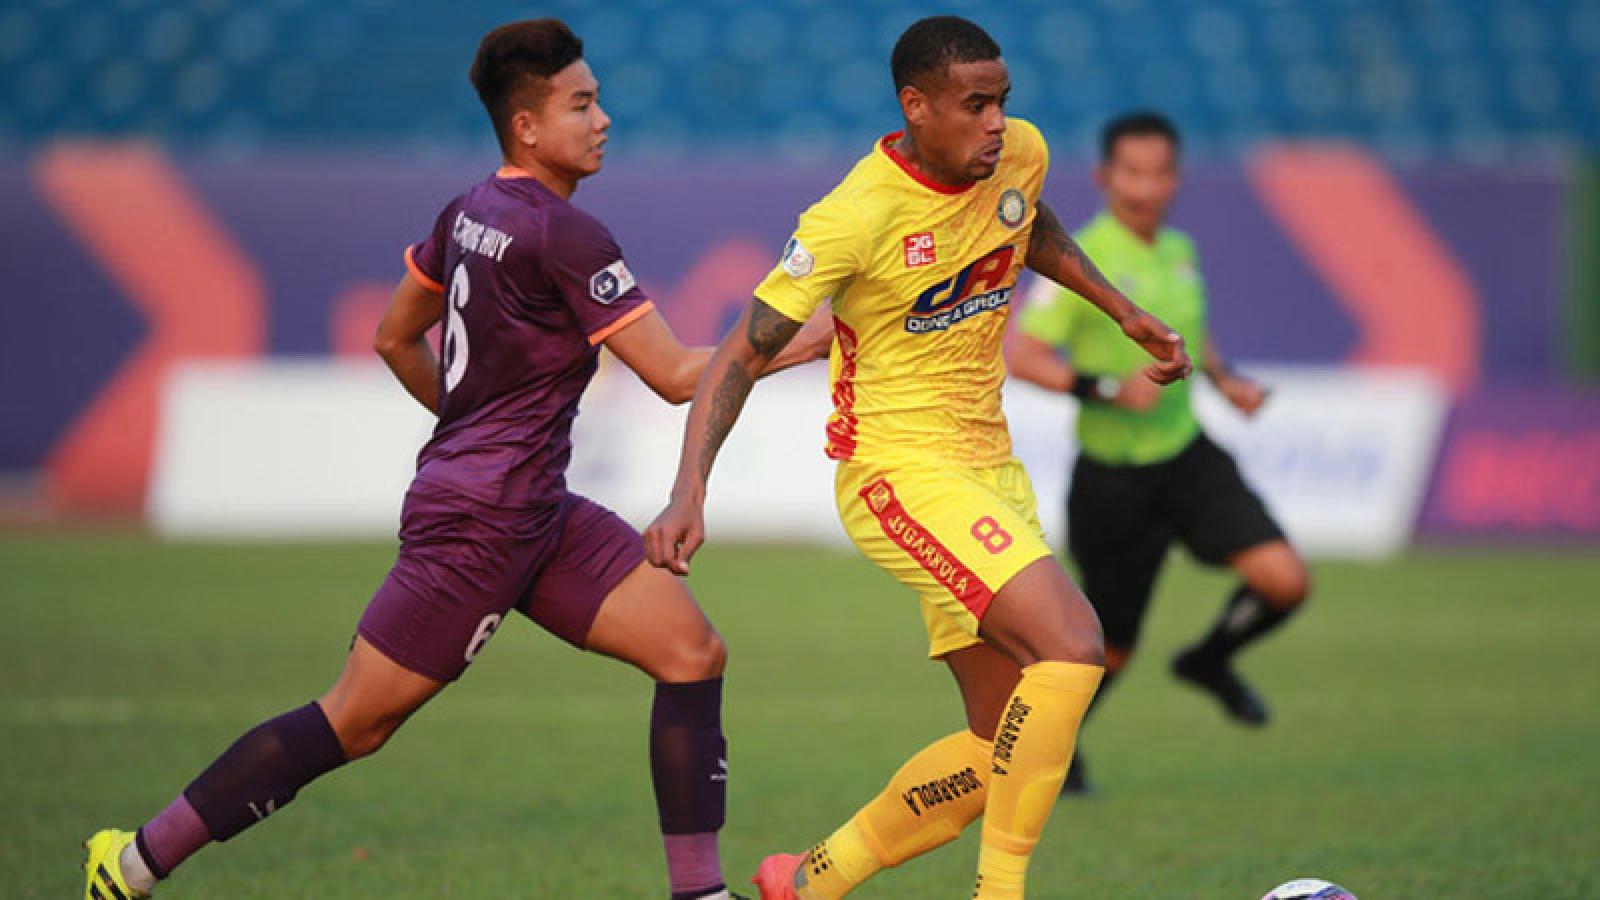 Go Dau stadium to host national U19 championship